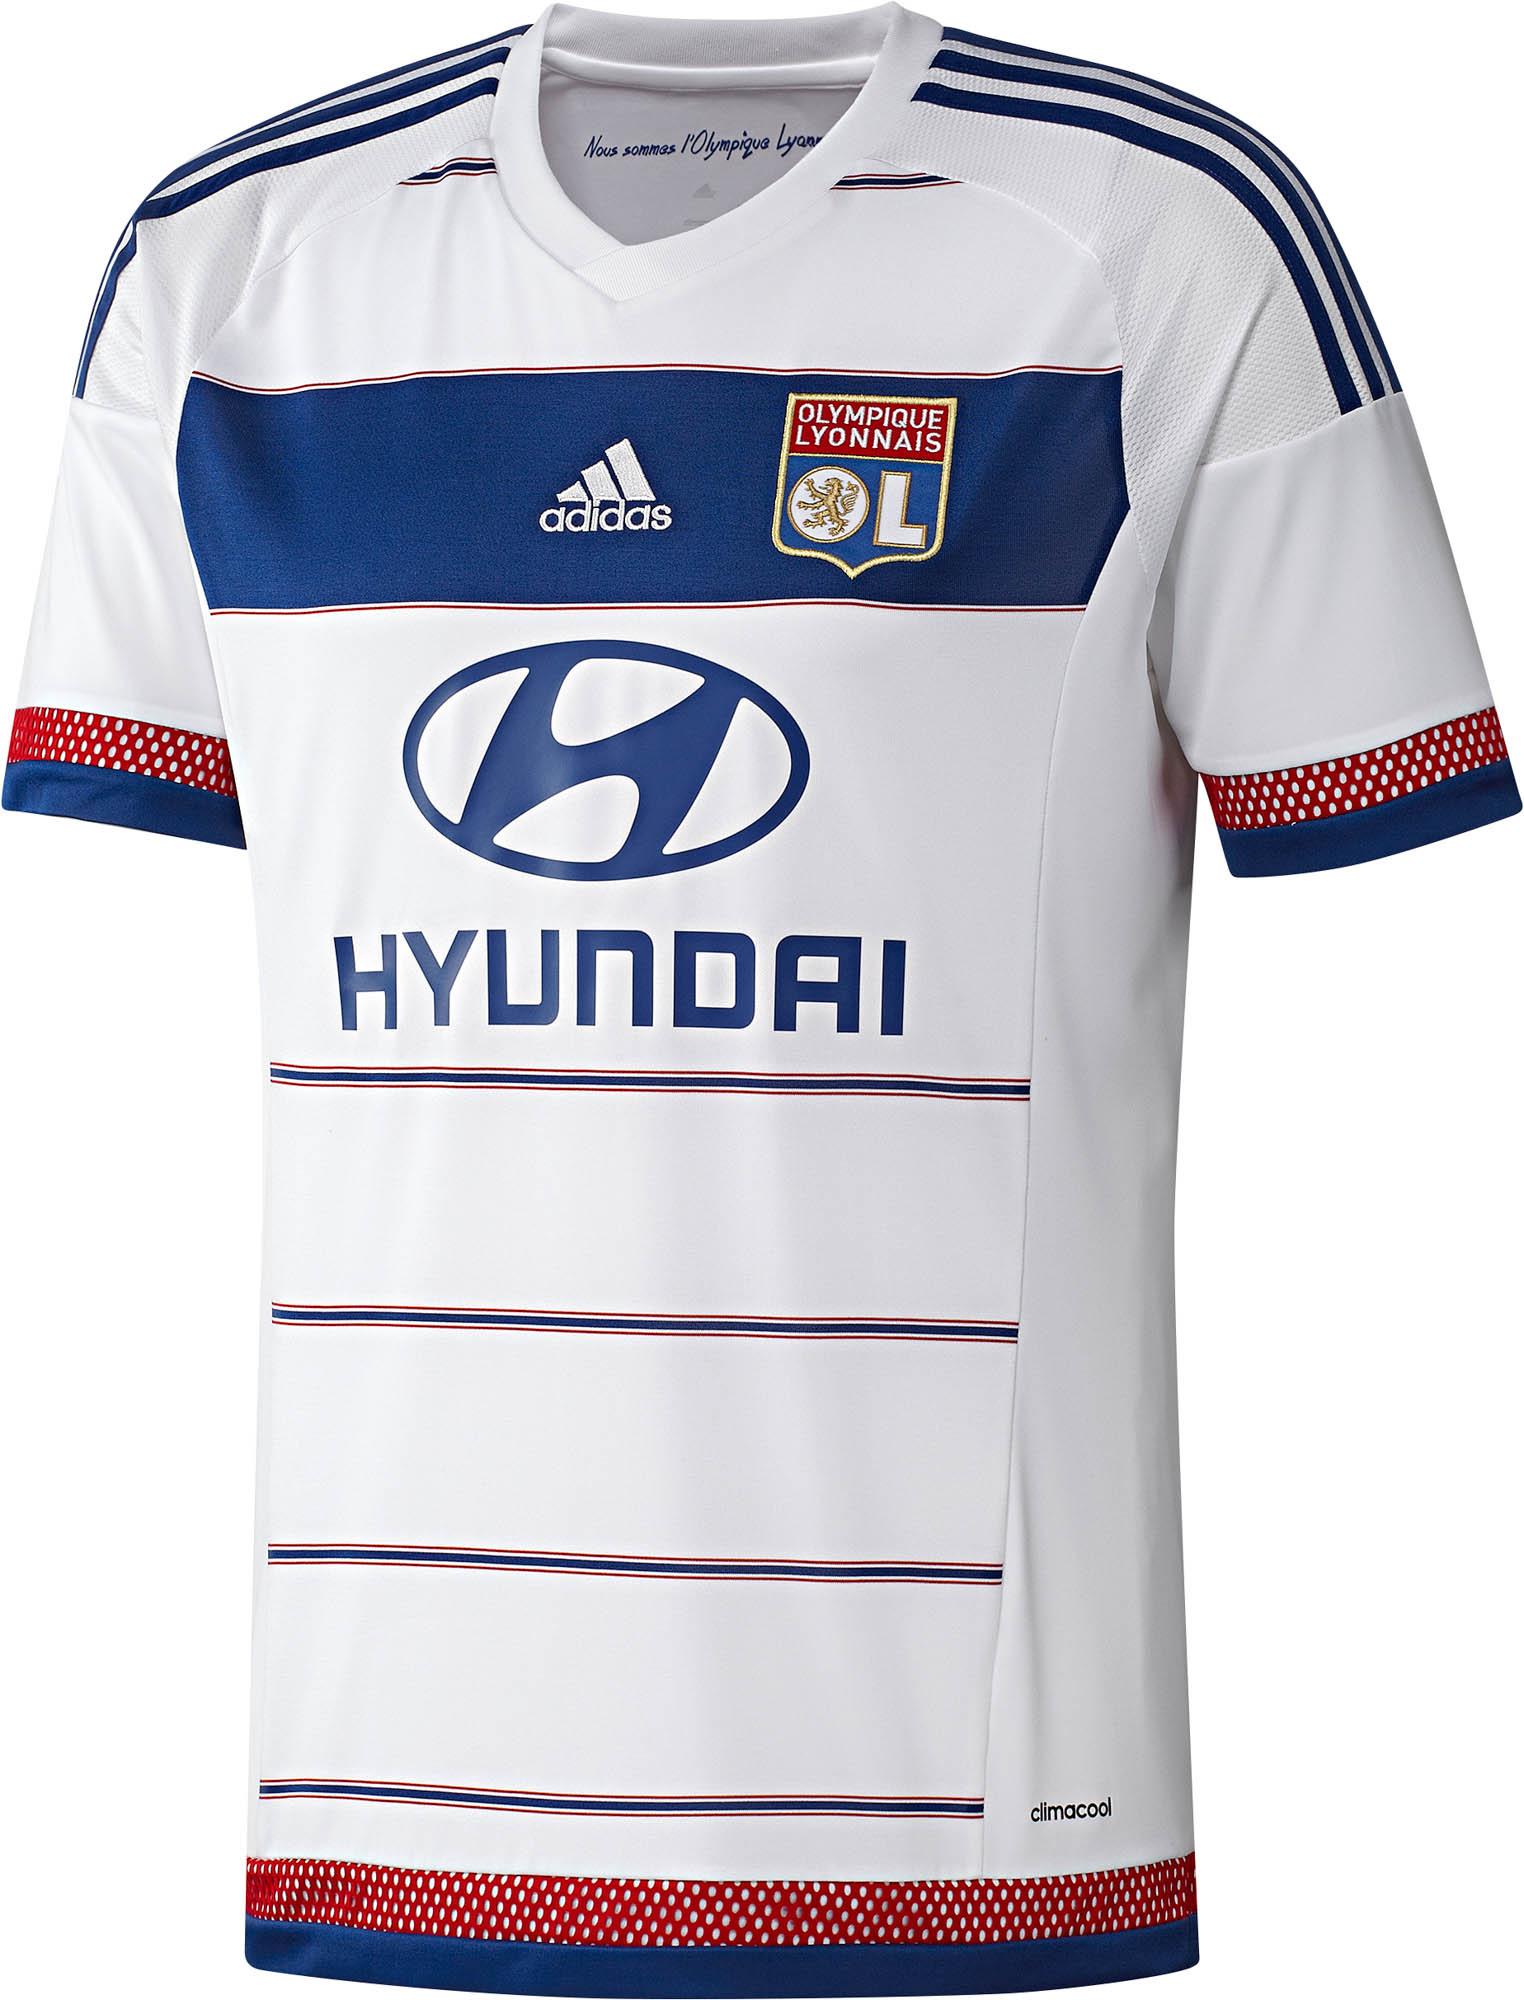 adidas Lyon Away Jersey - 2015 Olympique Lyonnais Soccer Jerseys